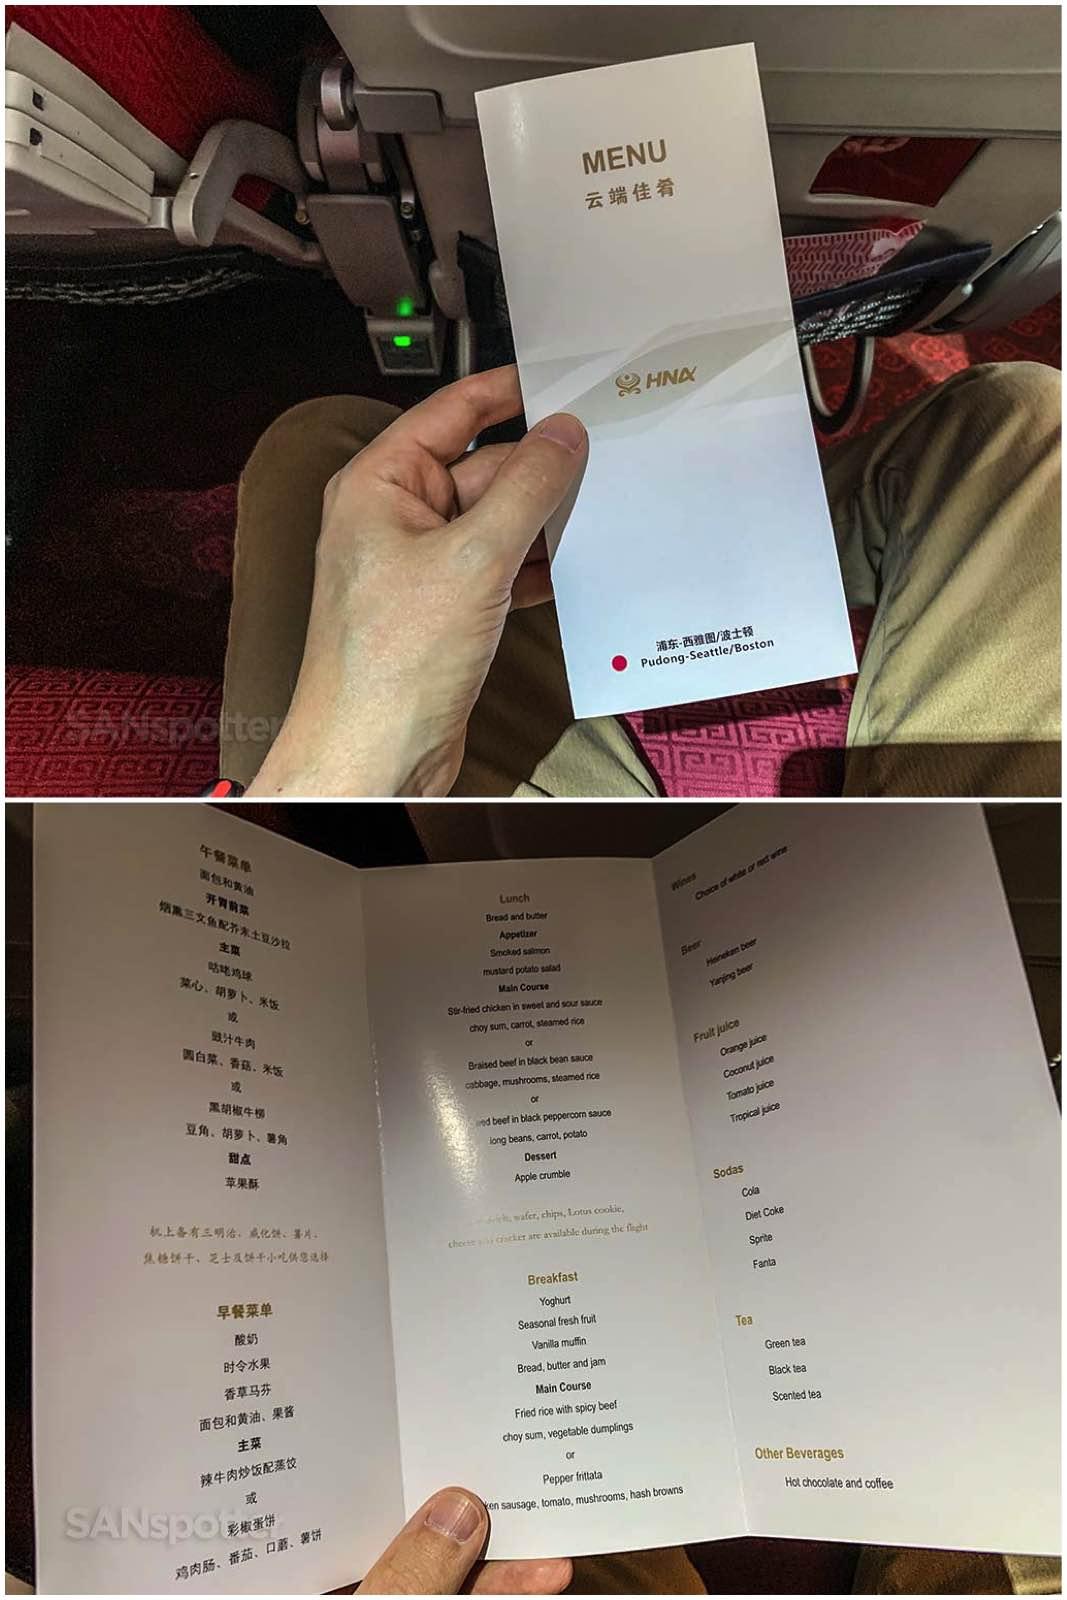 Hainan Airlines economy class menu